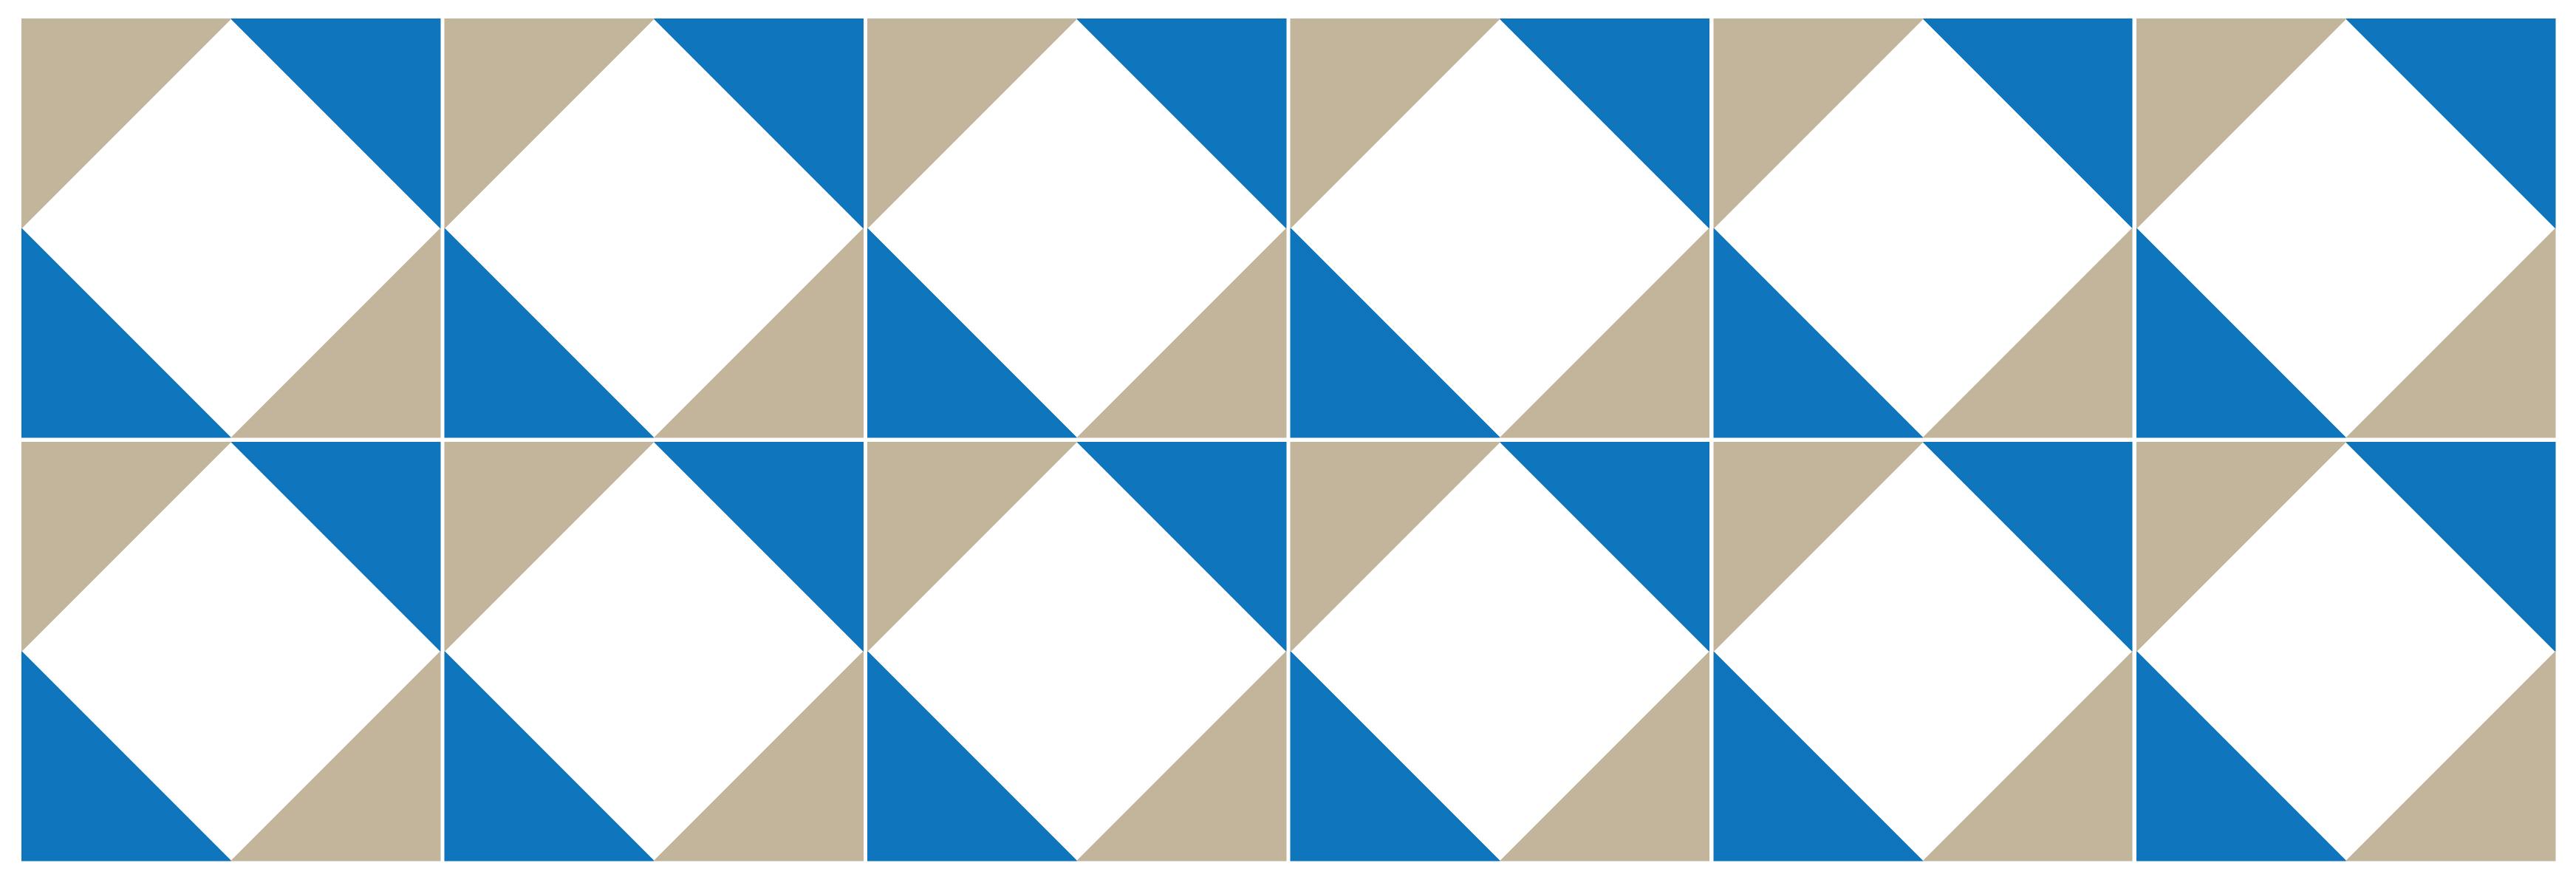 sticker pour carrelage g om trique bleu blanc et gris. Black Bedroom Furniture Sets. Home Design Ideas